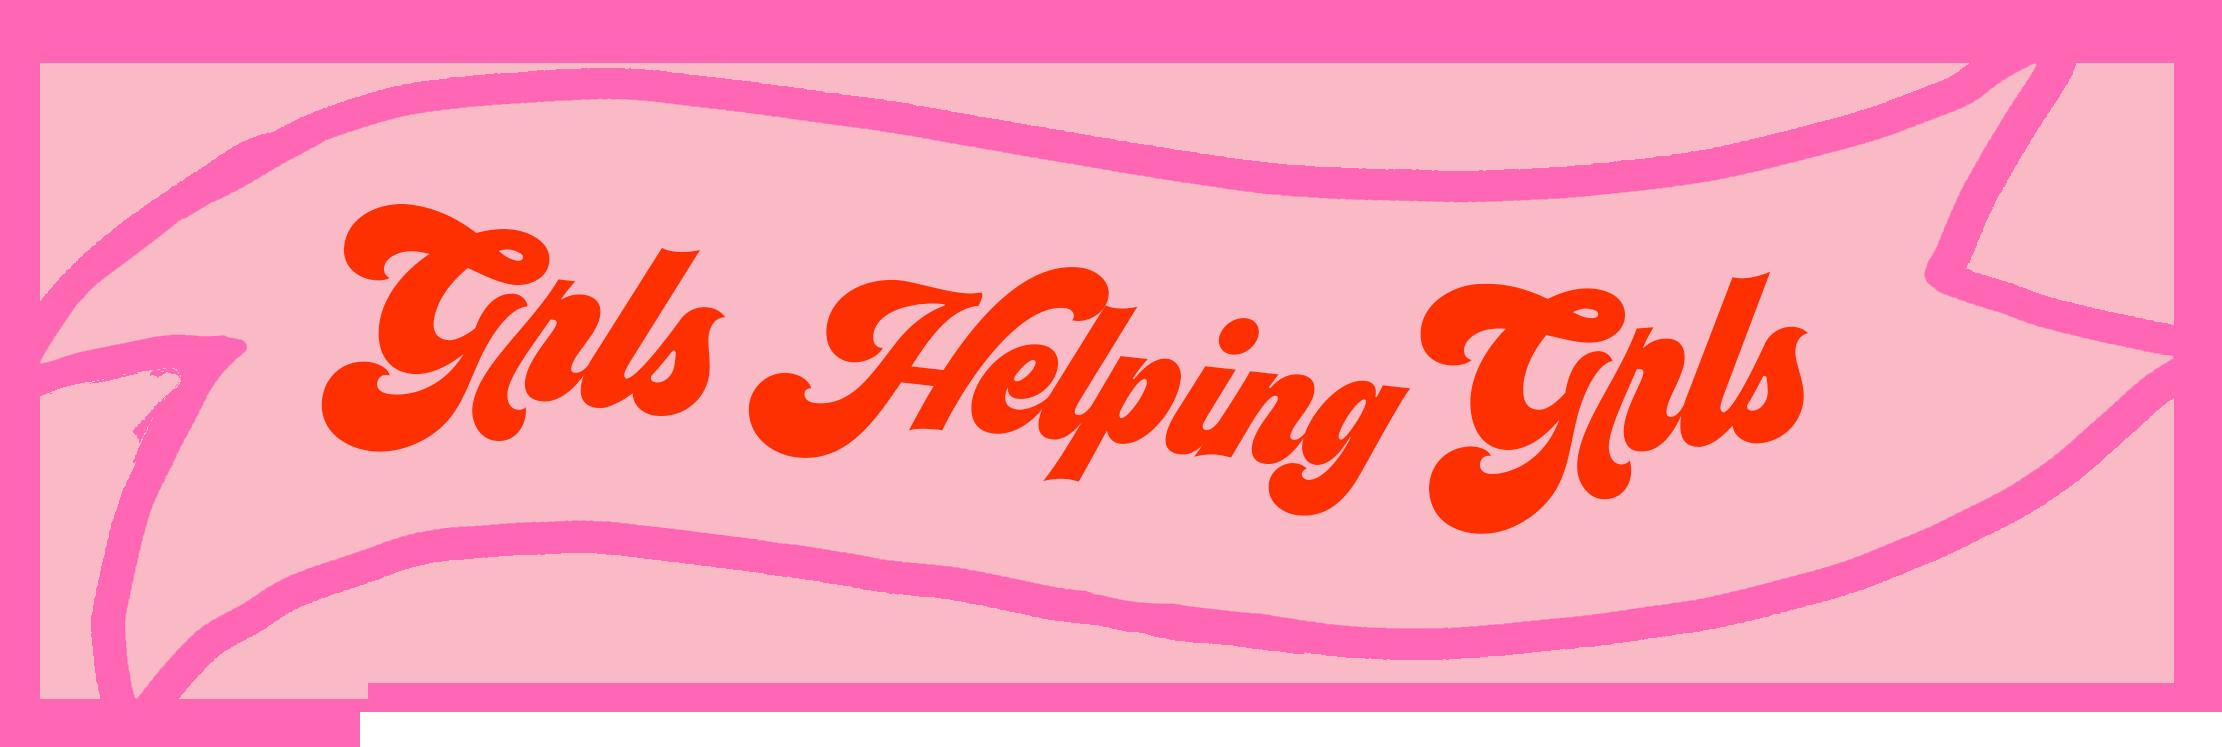 GRLS HELPING GRLS